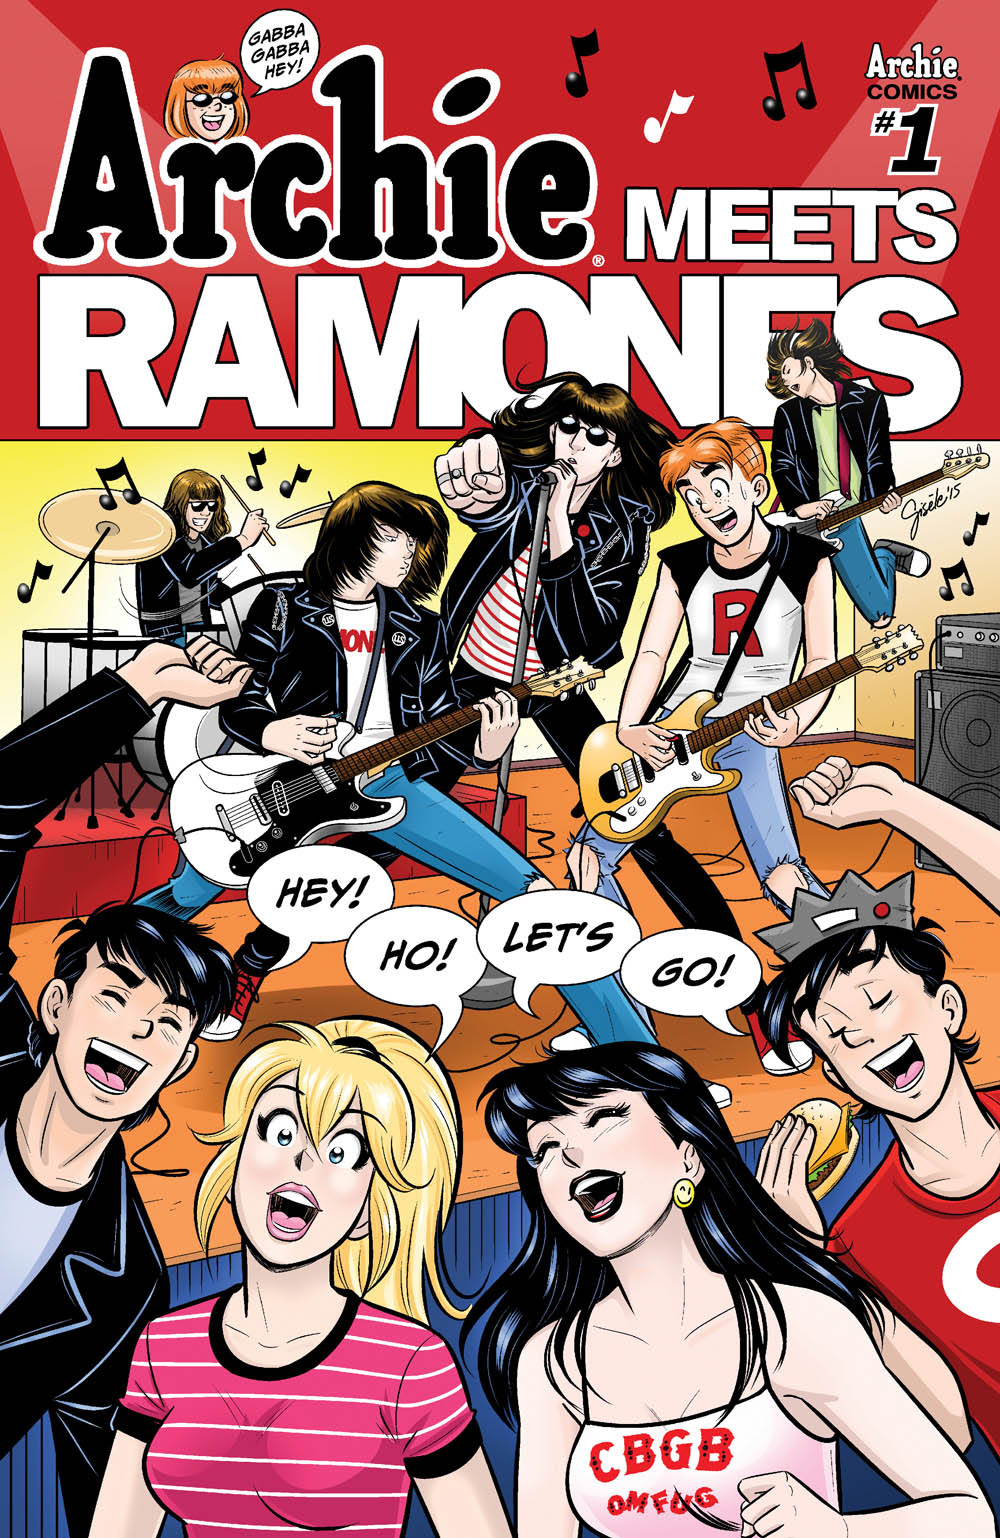 Archie Meets Ramones cover